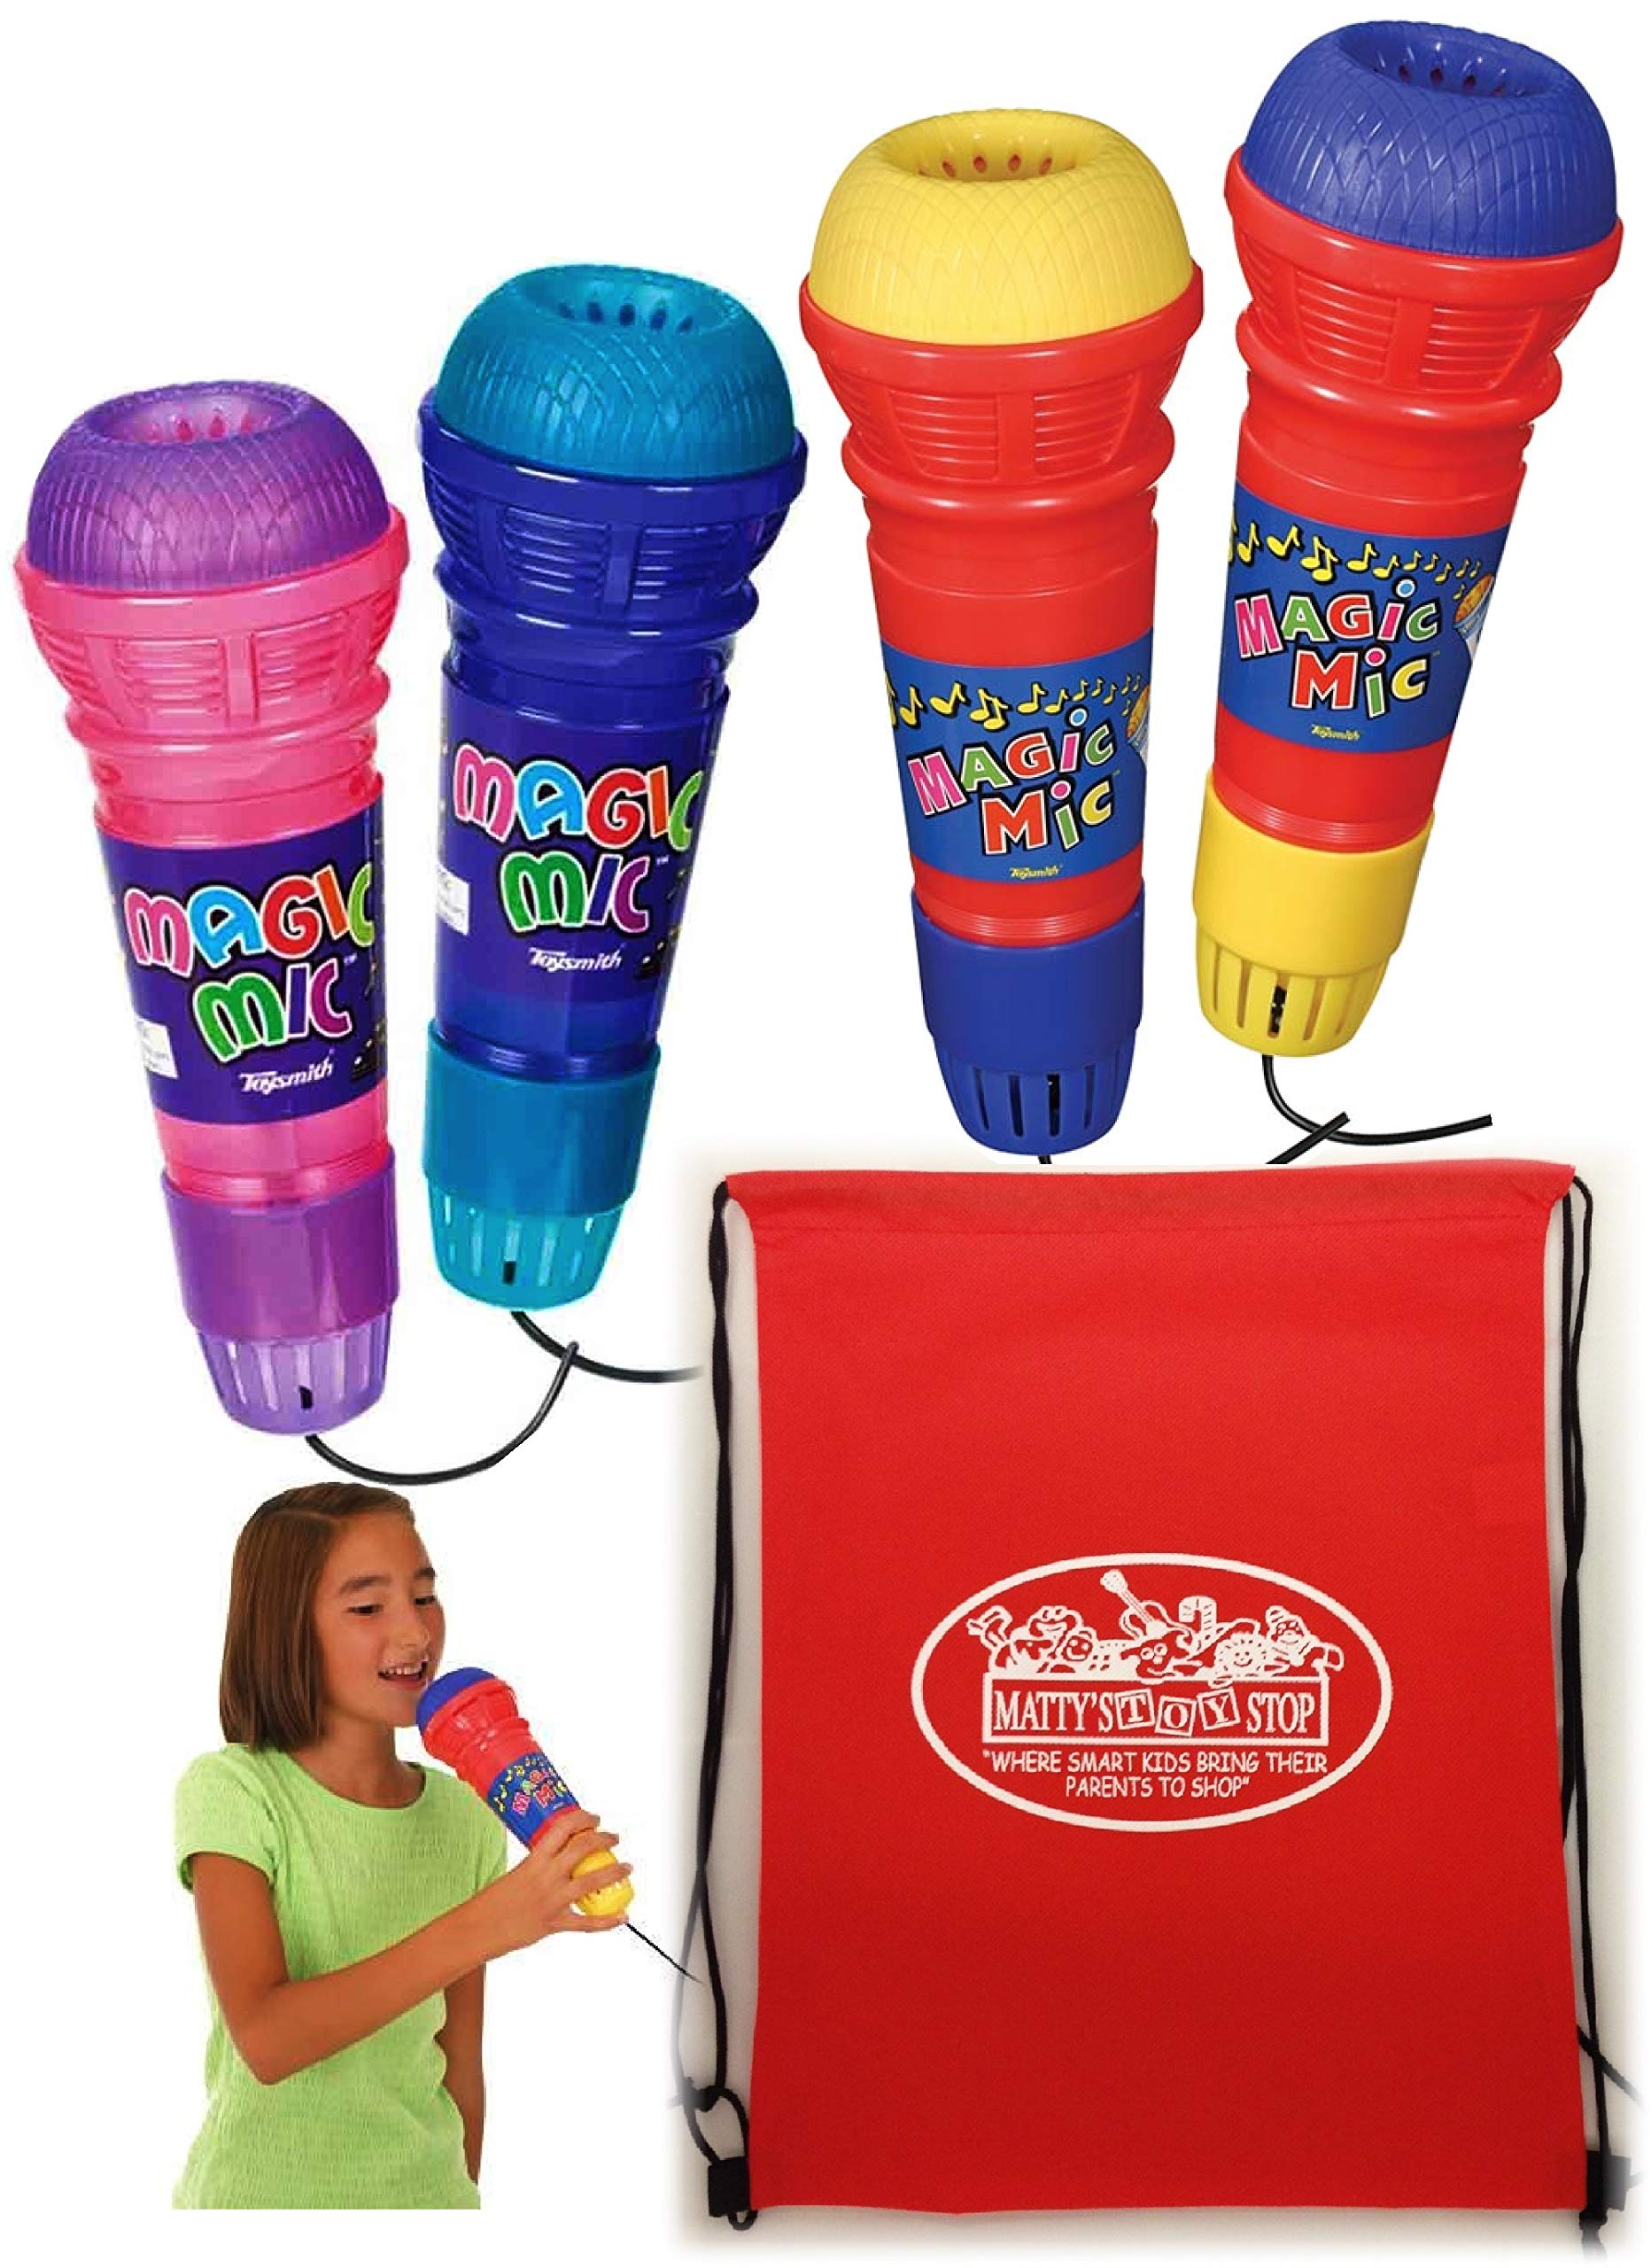 Toysmith Original Magic Mic & Translucent Magic Mic Complete Gift Set Bundle with Bonus Matty's Toy Stop Storage Bag - 4 Pack